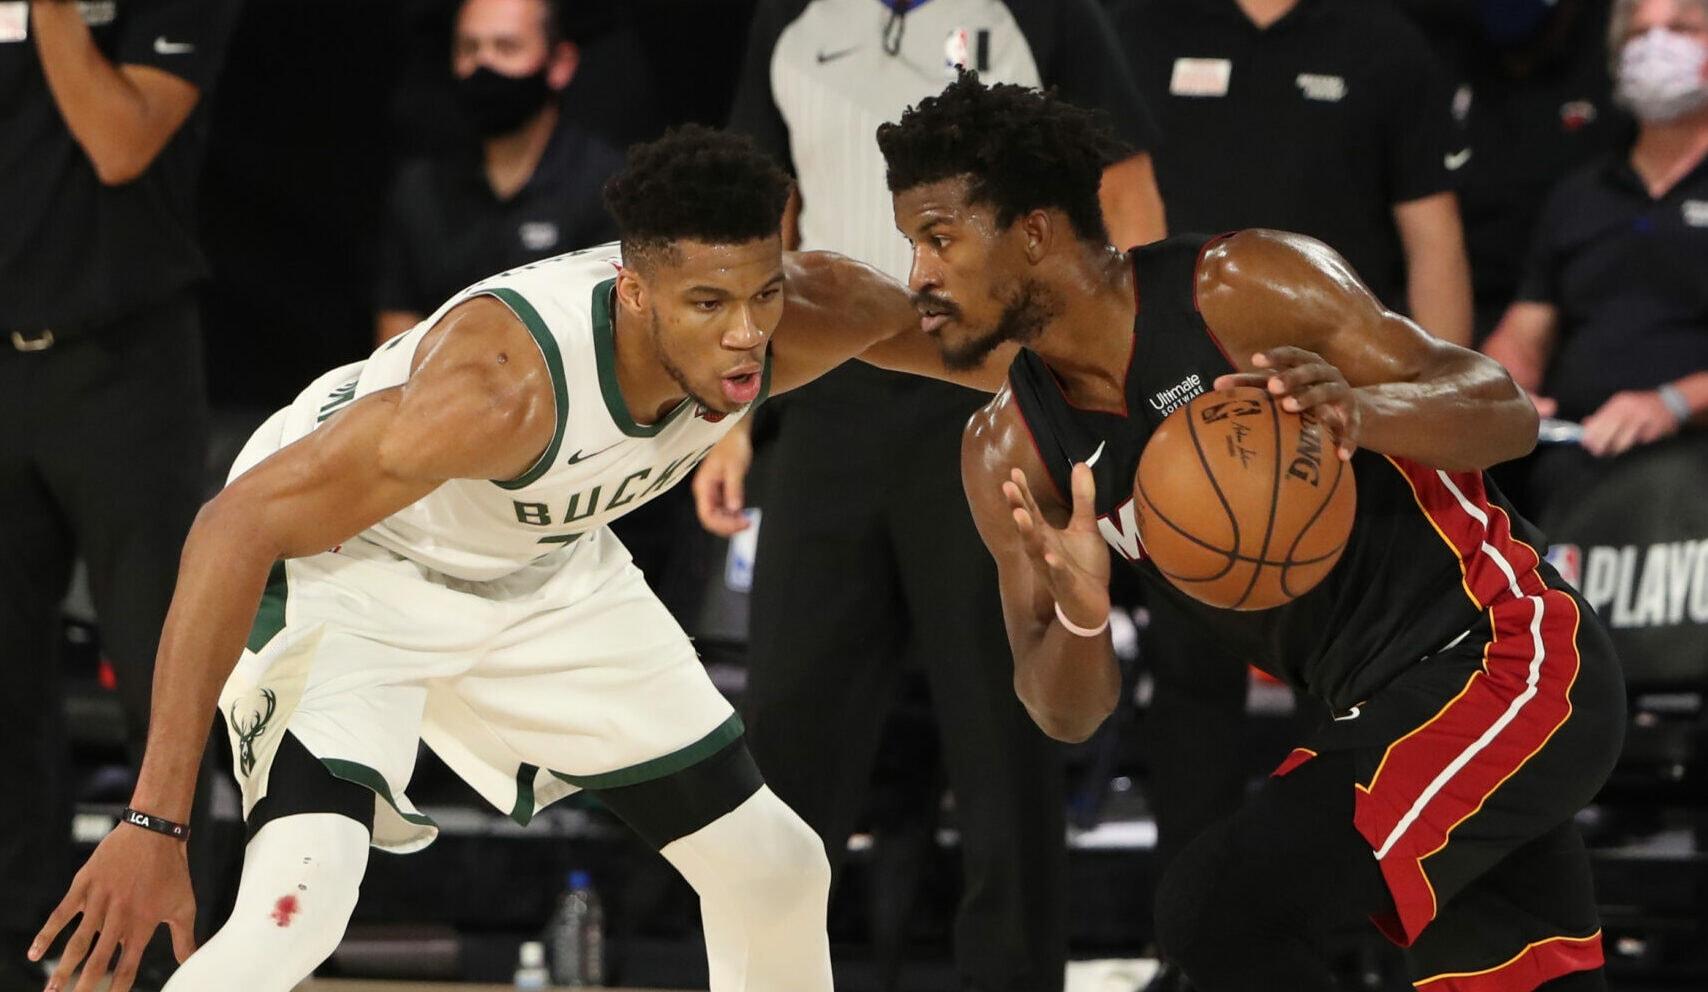 Numbers preview: Bucks (3) vs. Heat (6)